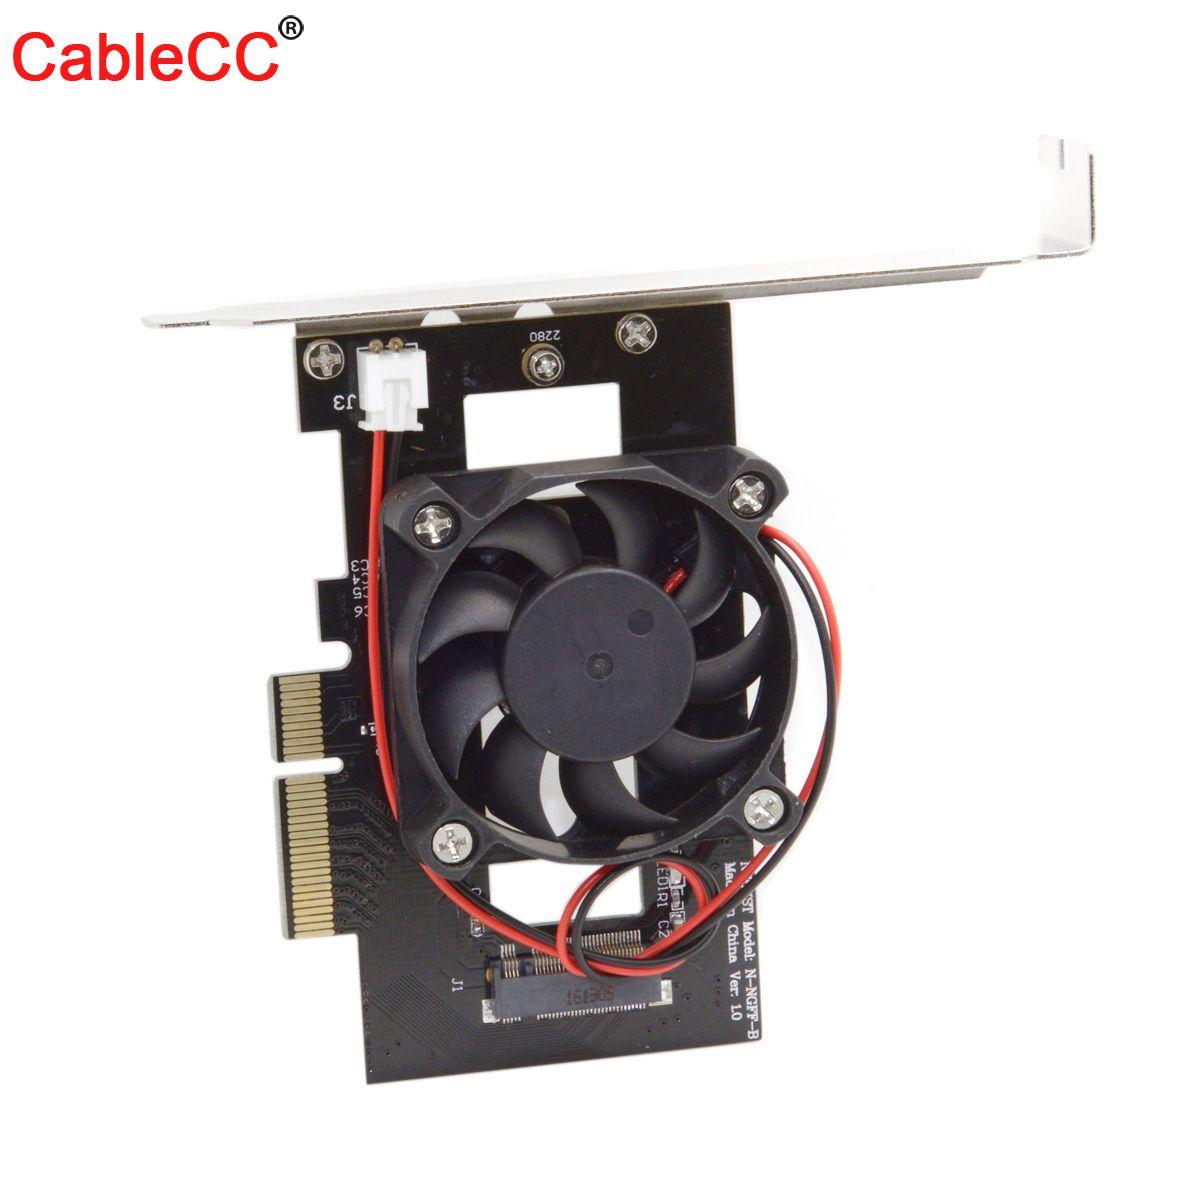 PCI-E 3,0x4 хост адаптер конвертер карта M.2 NGFF M ключ SSD в Nvme PCI Express с охлаждающим вентилятором